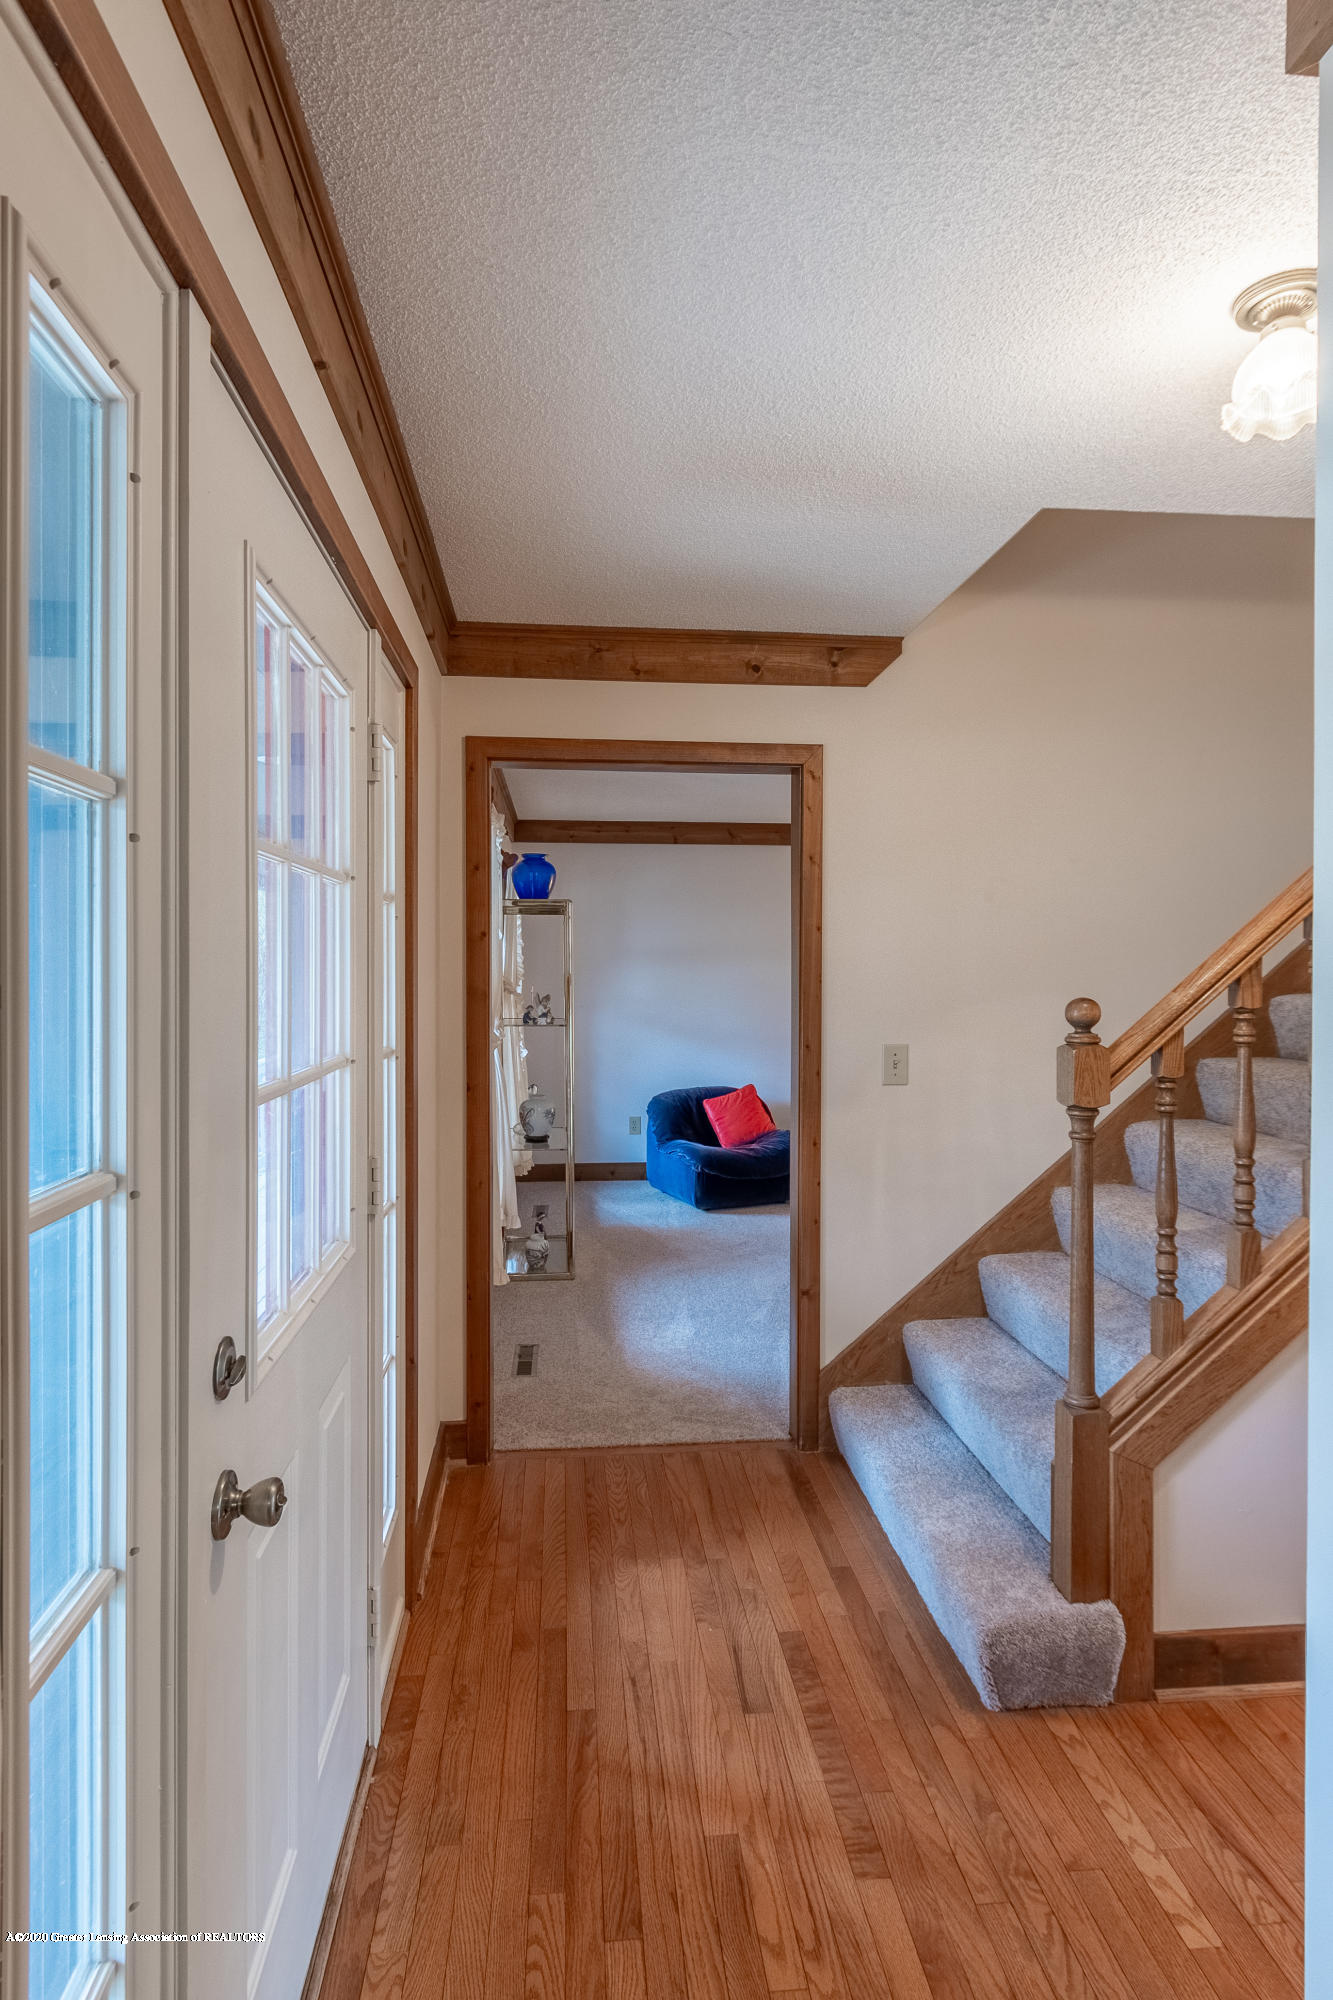 3945 Breckinridge Dr - Foyer - 7